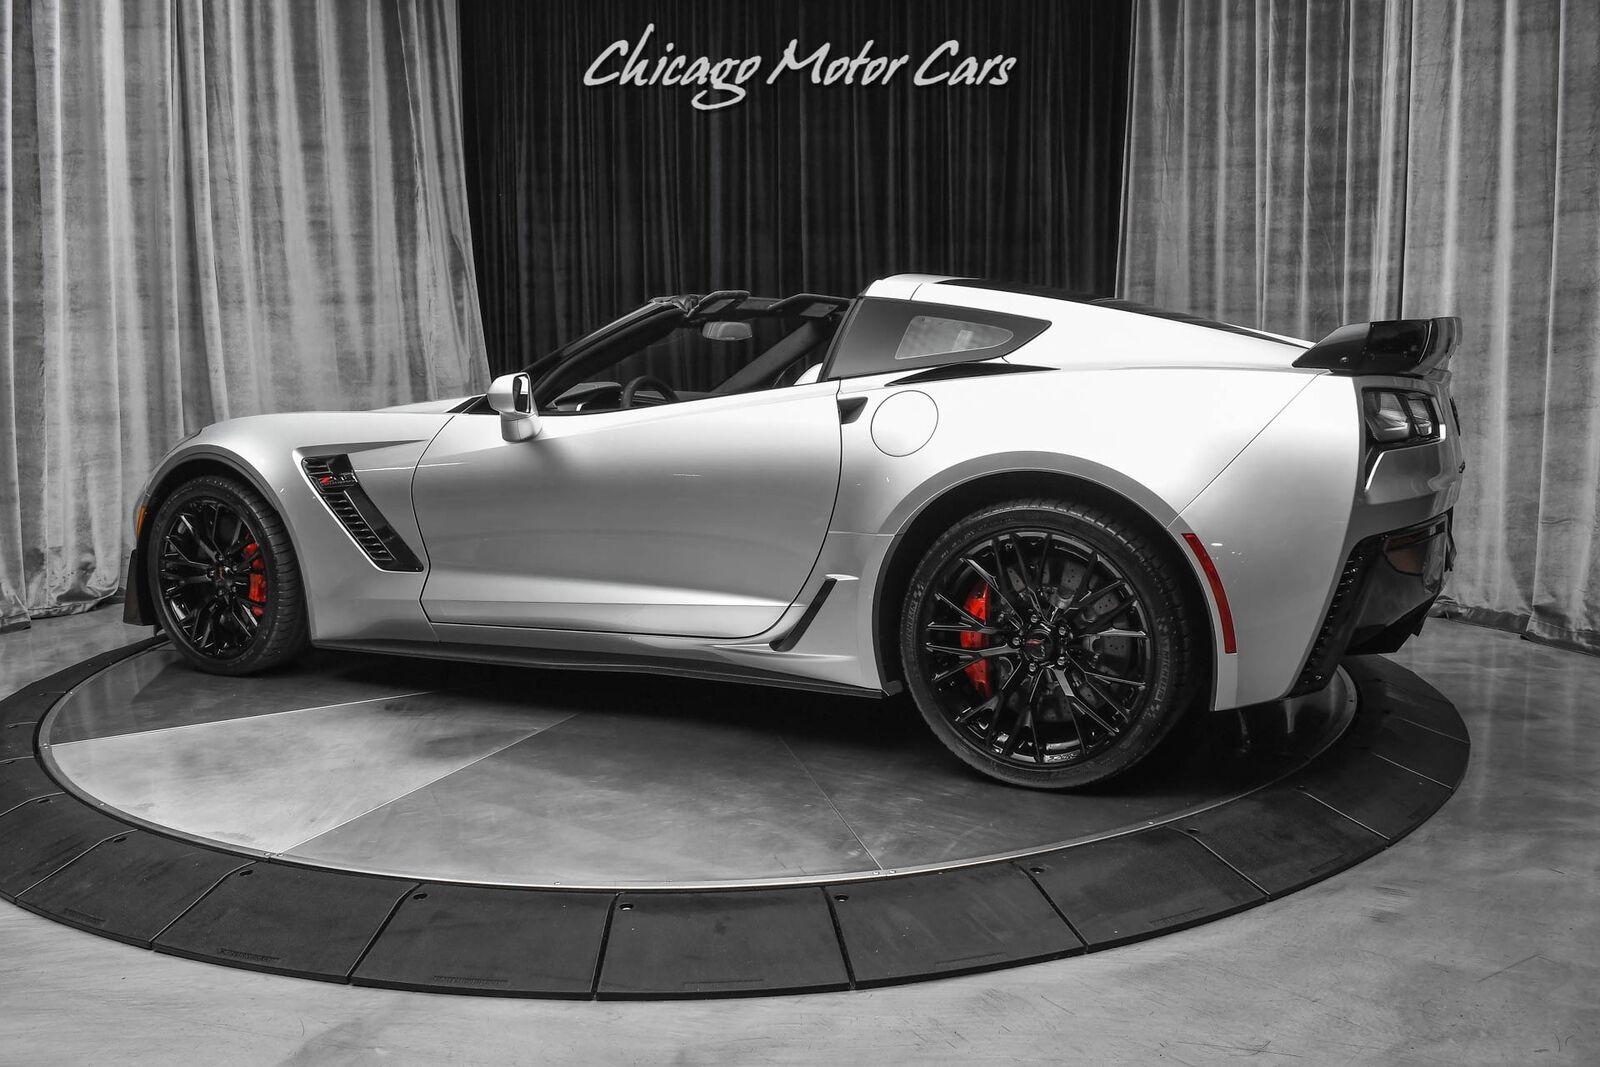 2016 Silver Chevrolet Corvette Z06 3LZ   C7 Corvette Photo 3